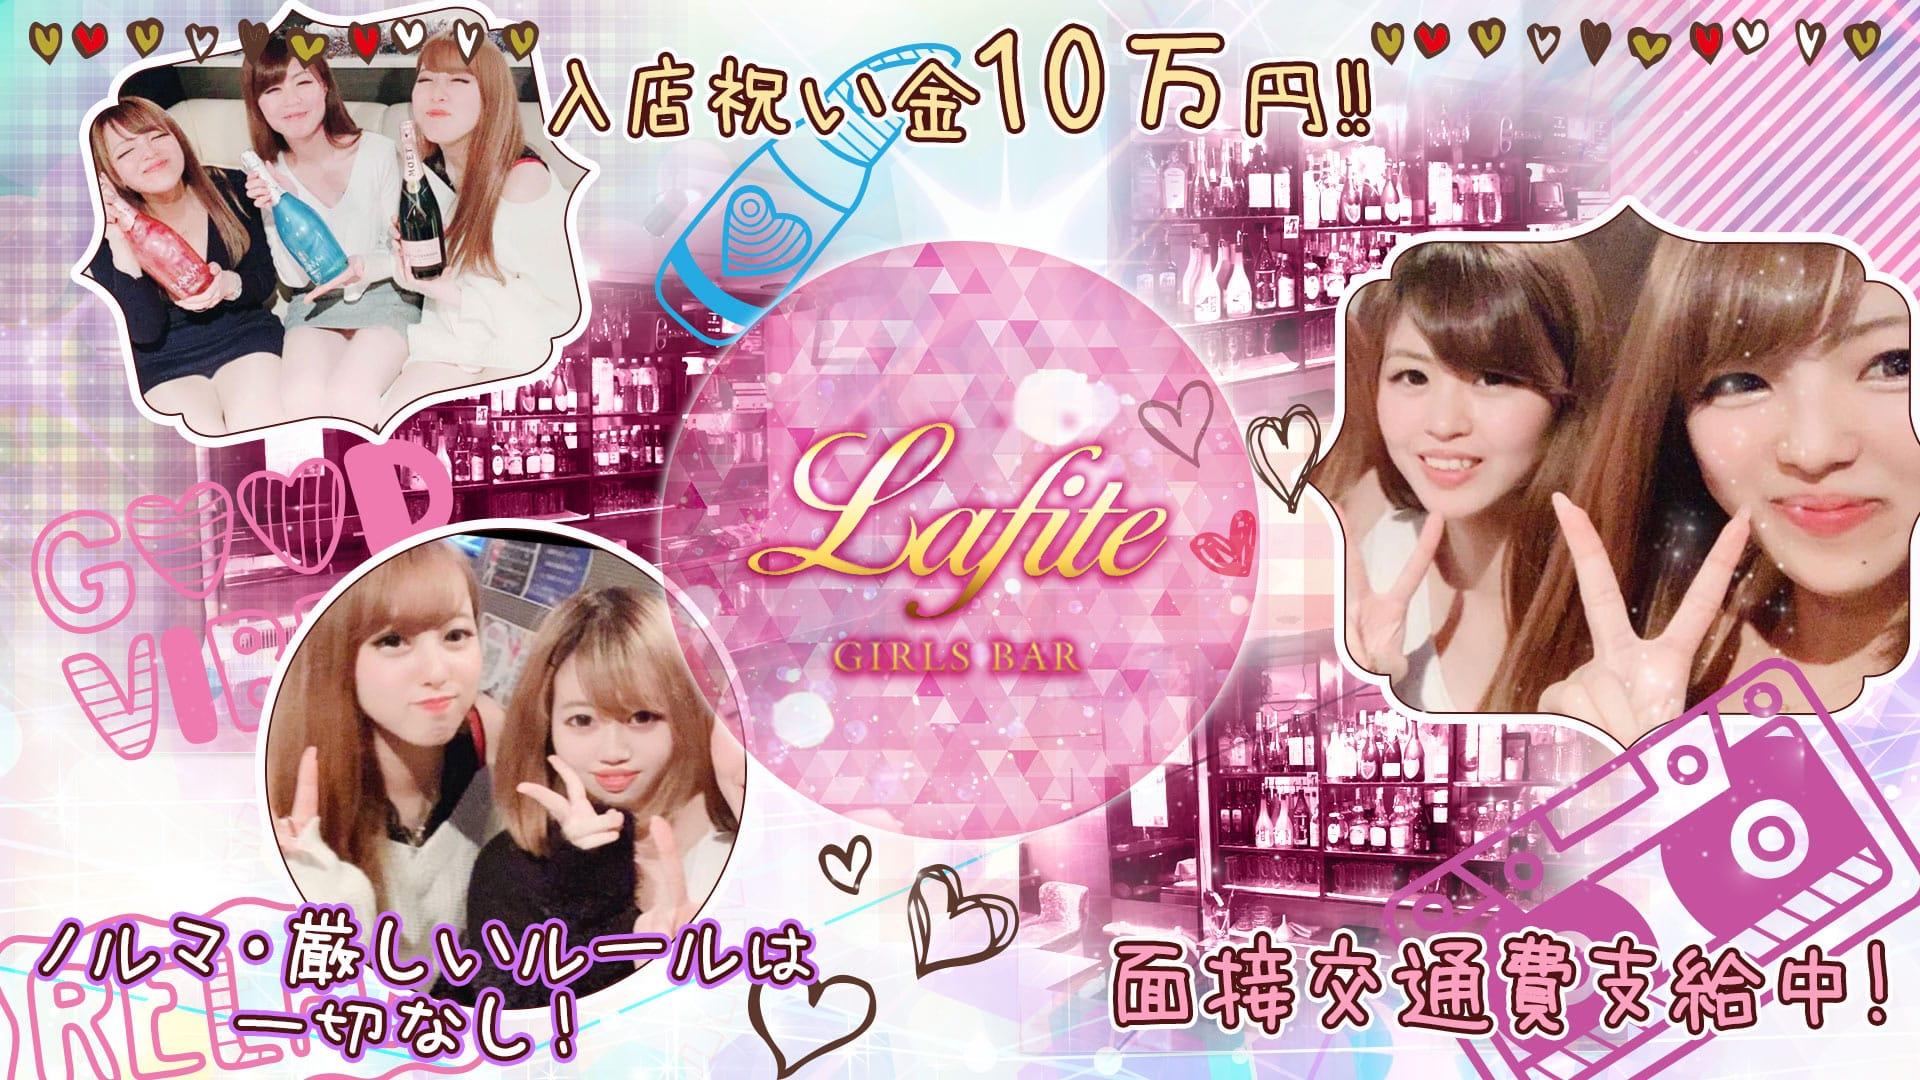 GIRLS BAR Lafite(ラフィット) 大宮ガールズバー TOP画像